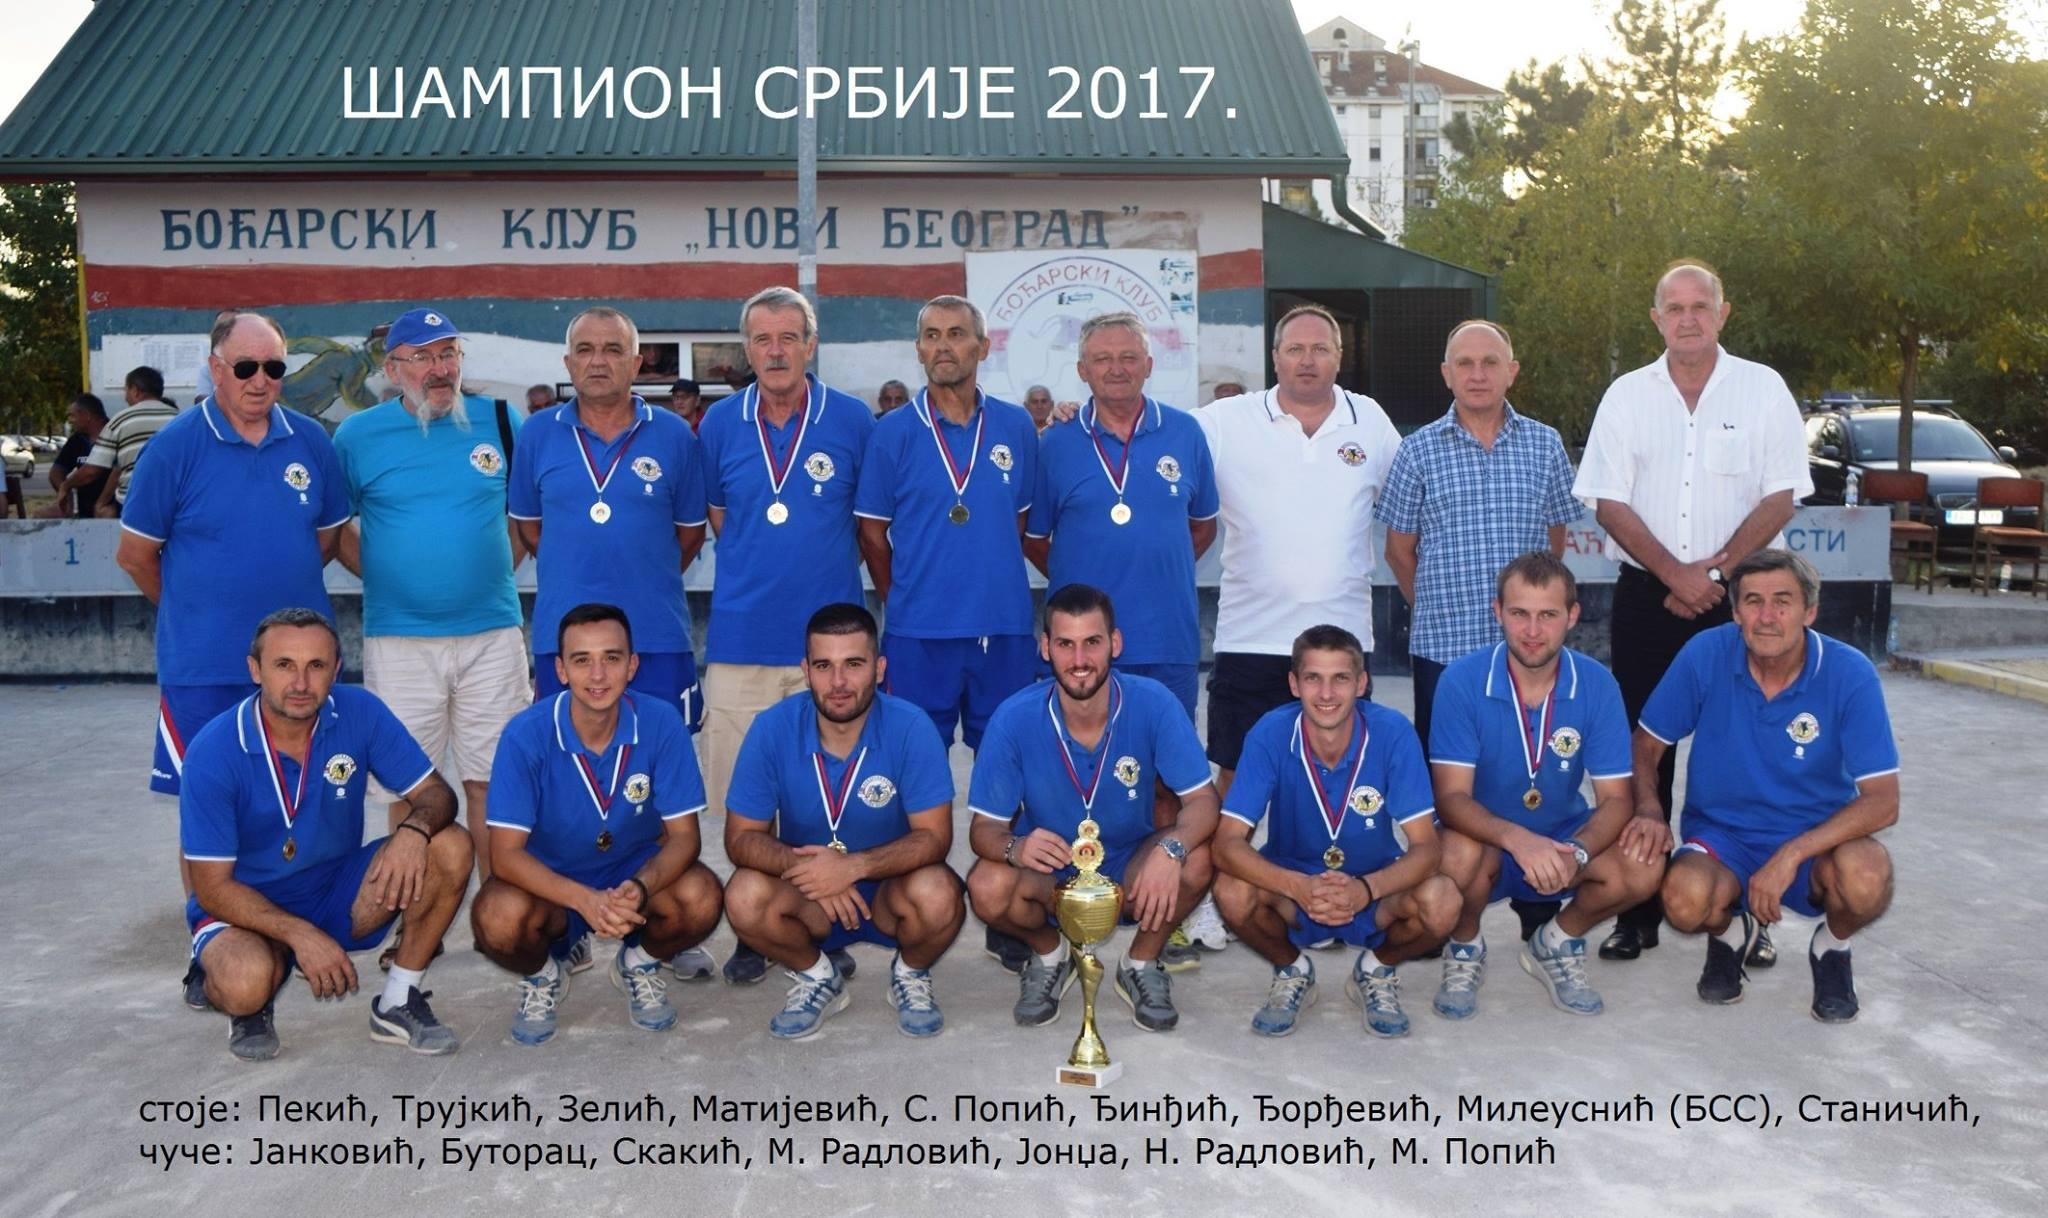 Sapion 2017 BK N. Beograd